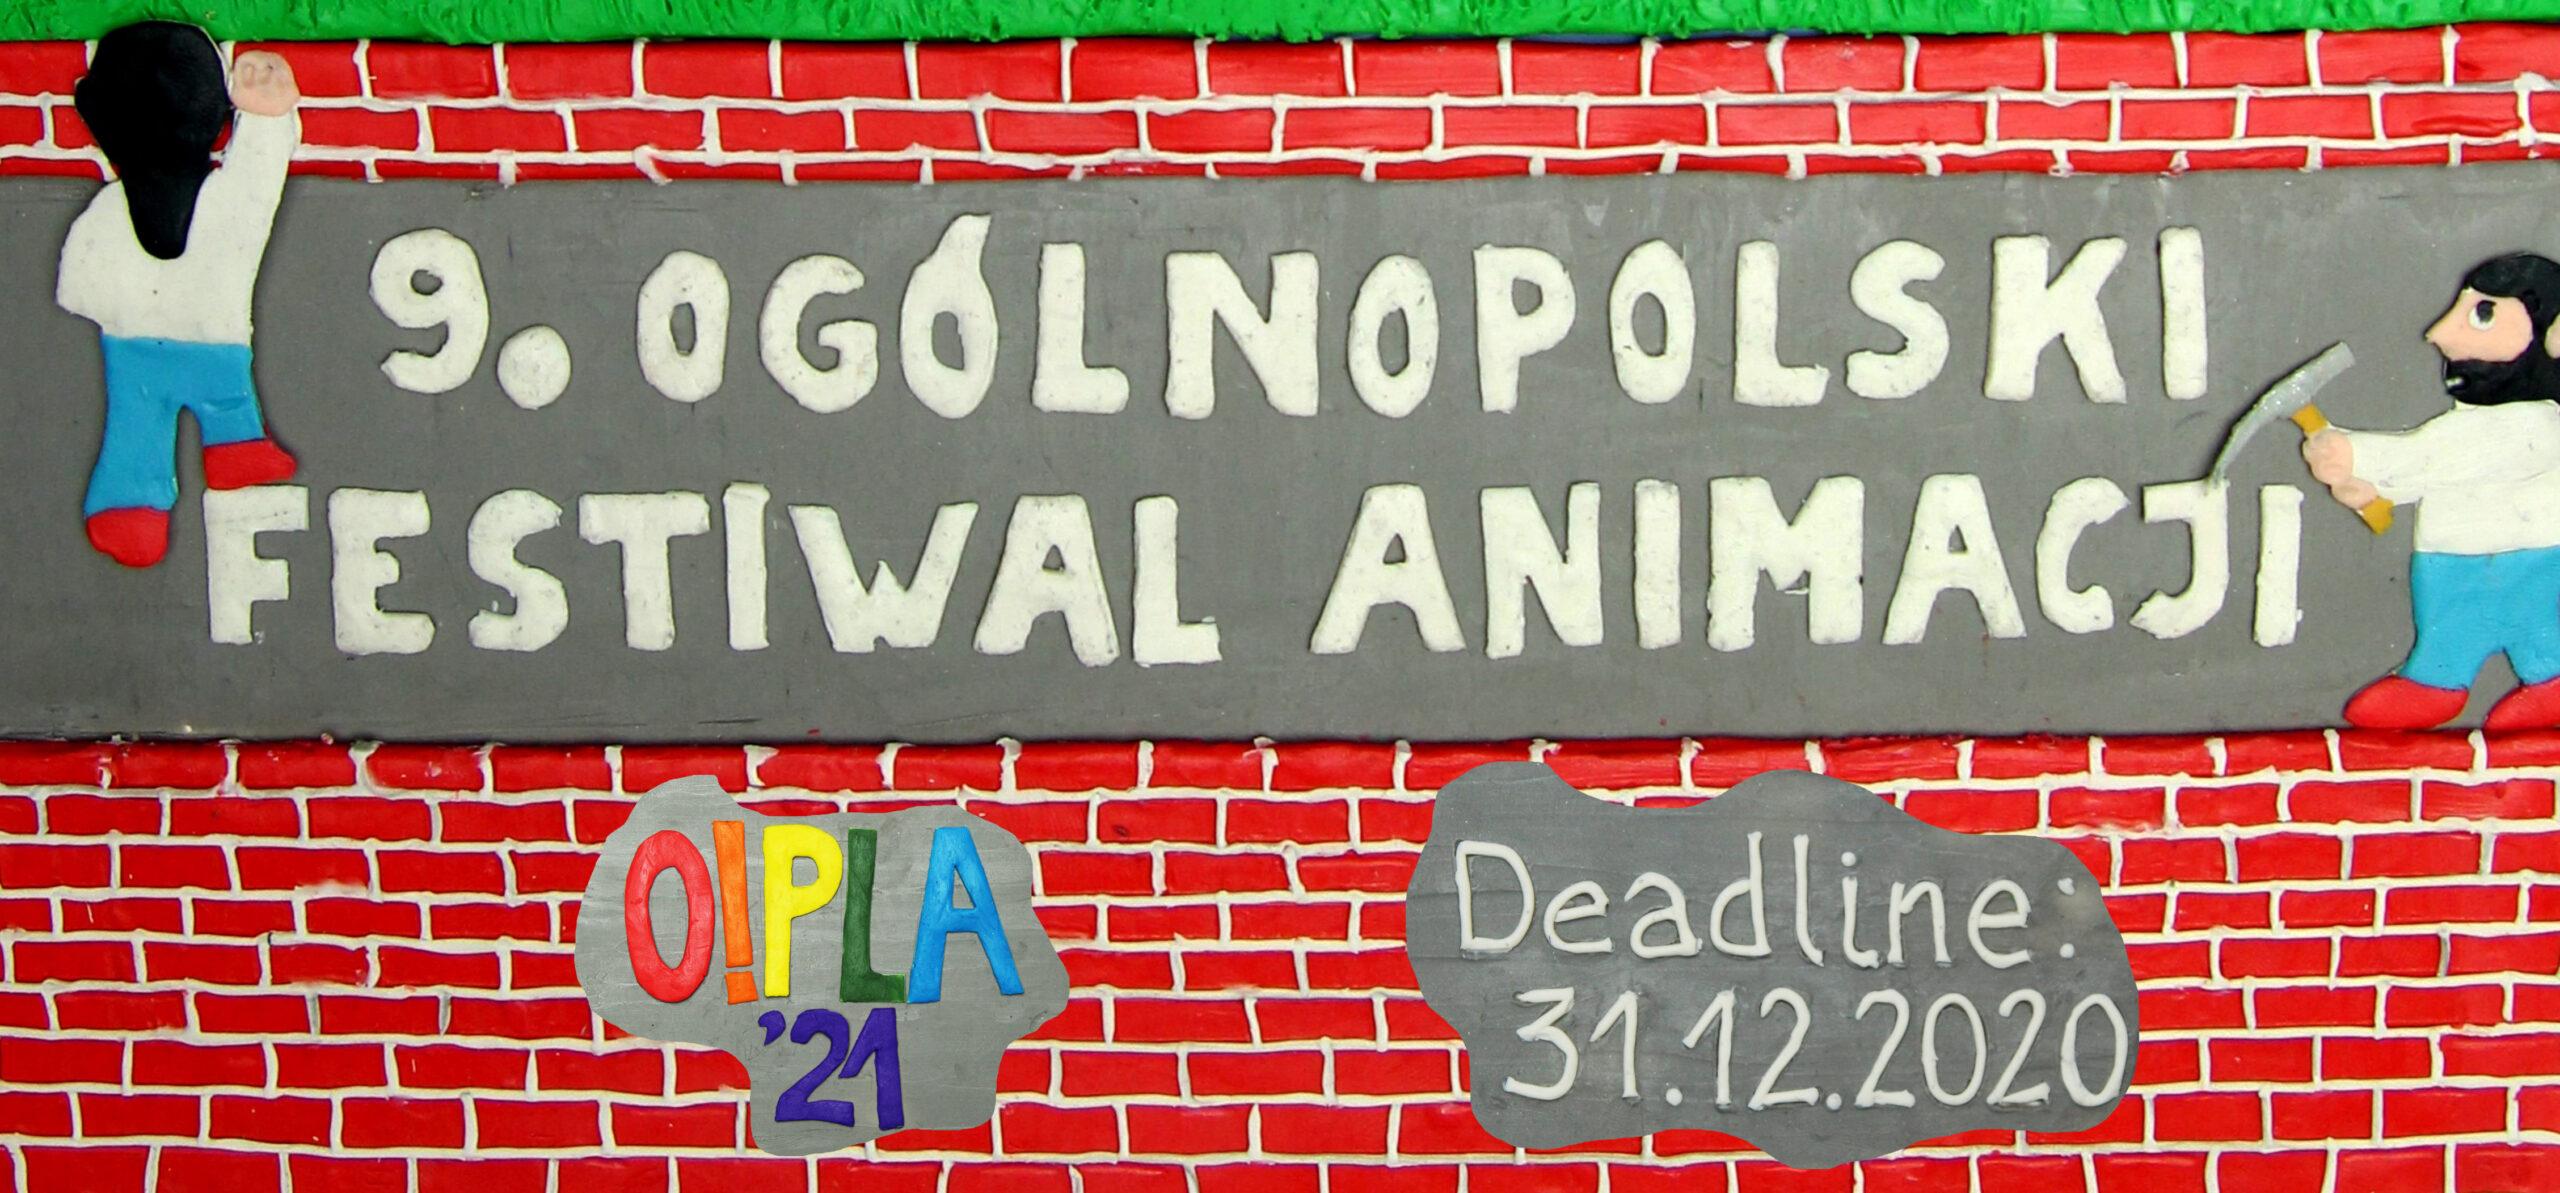 deadline-plus-opla-2